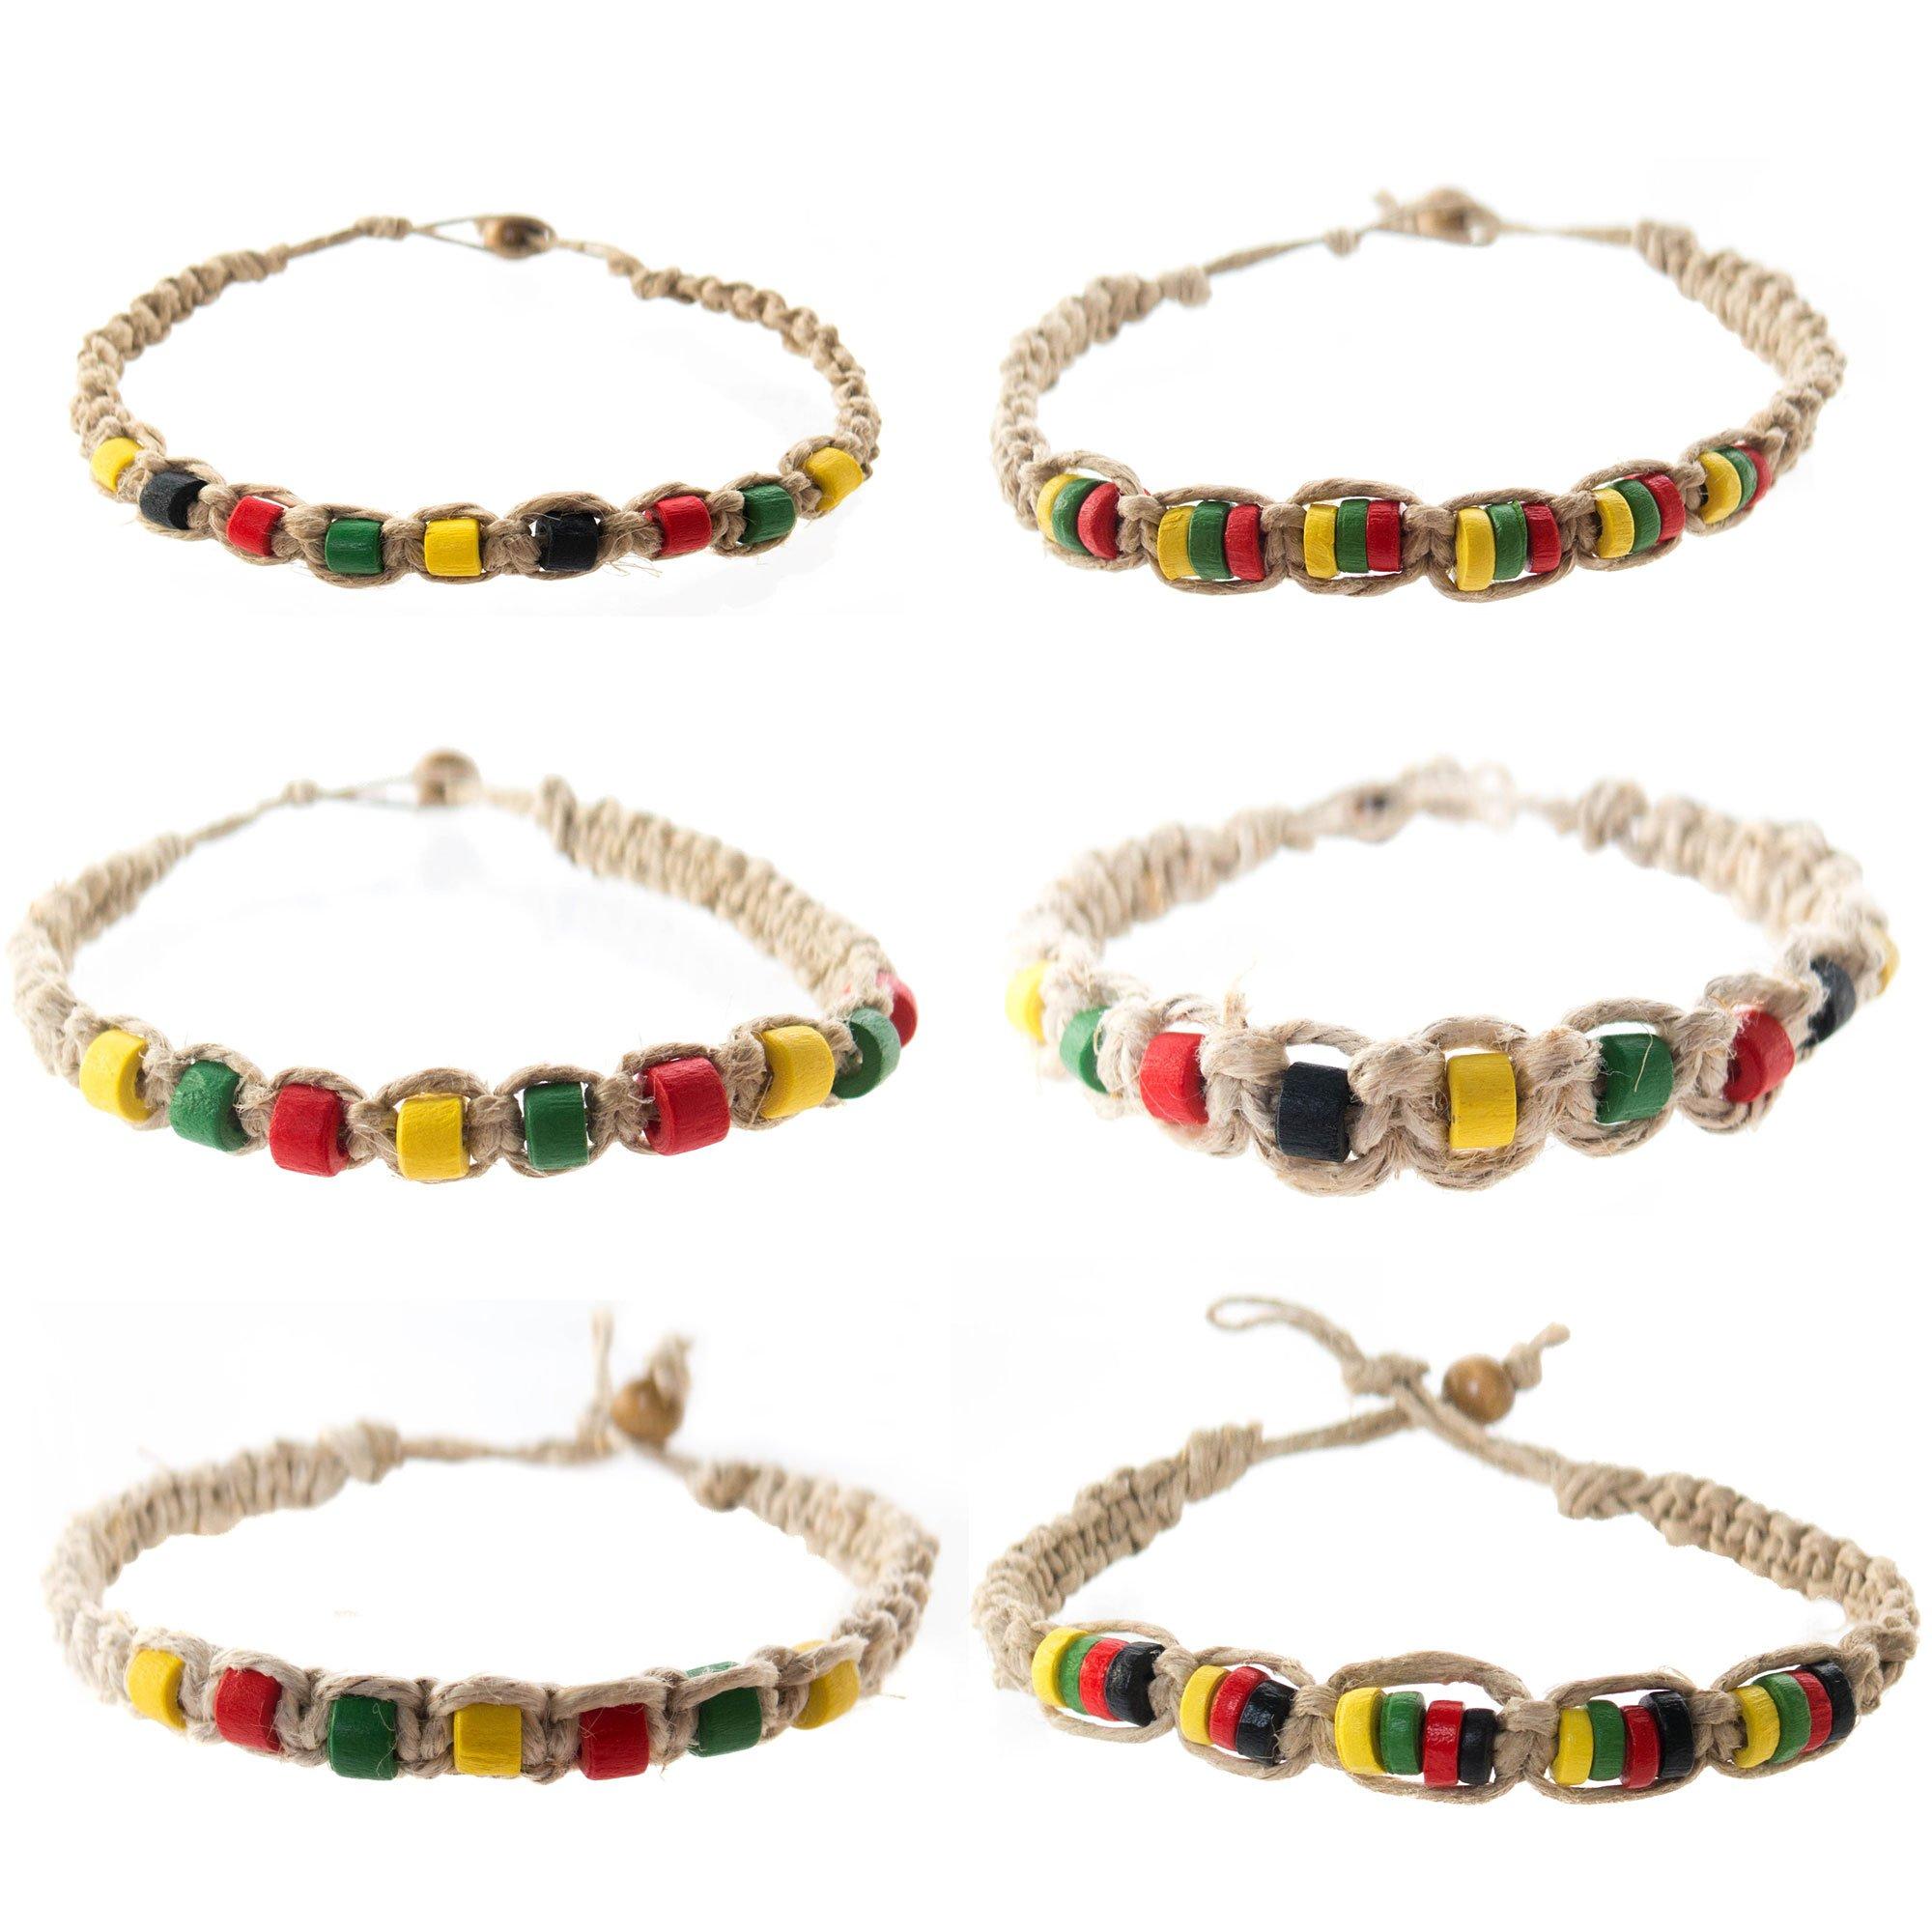 FROG SAC Hemp Bracelet for Men 6 PCs Pack - Rasta Bracelets with Jamaican Color Beads - Handmade - Braided with Natural Rope - Mens Reggae Theme Surfer Summer Jewelry